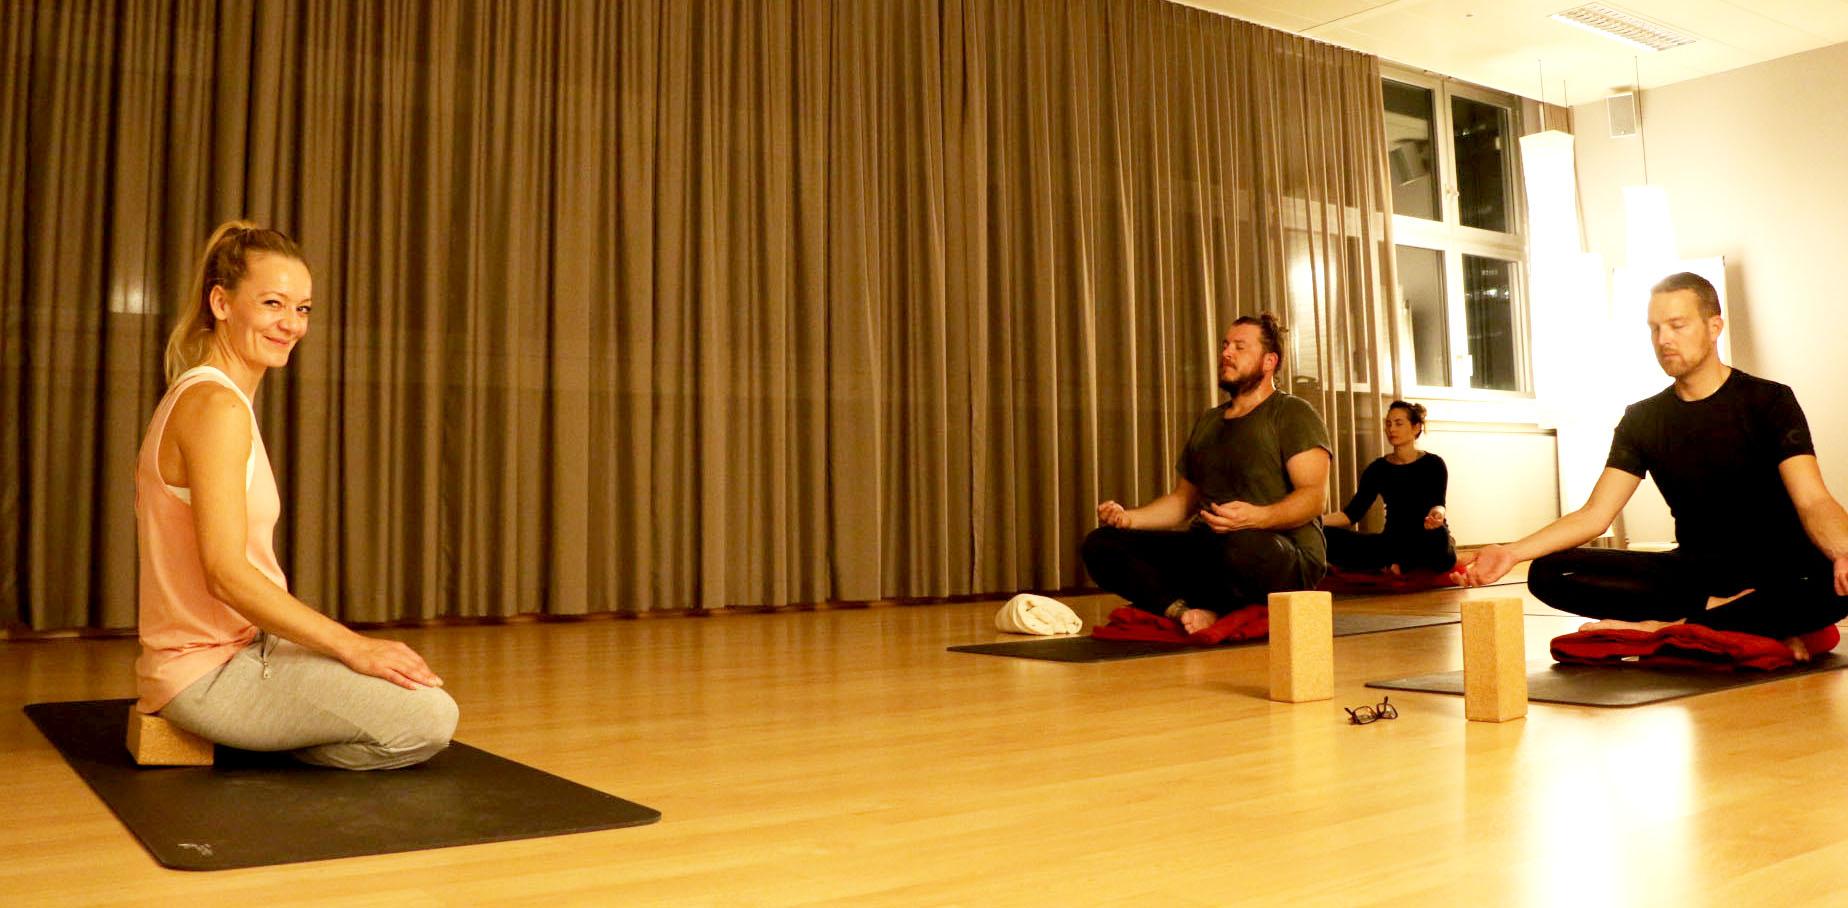 Meditation innere balance st rken erholung finden for Raumgestaltung yoga